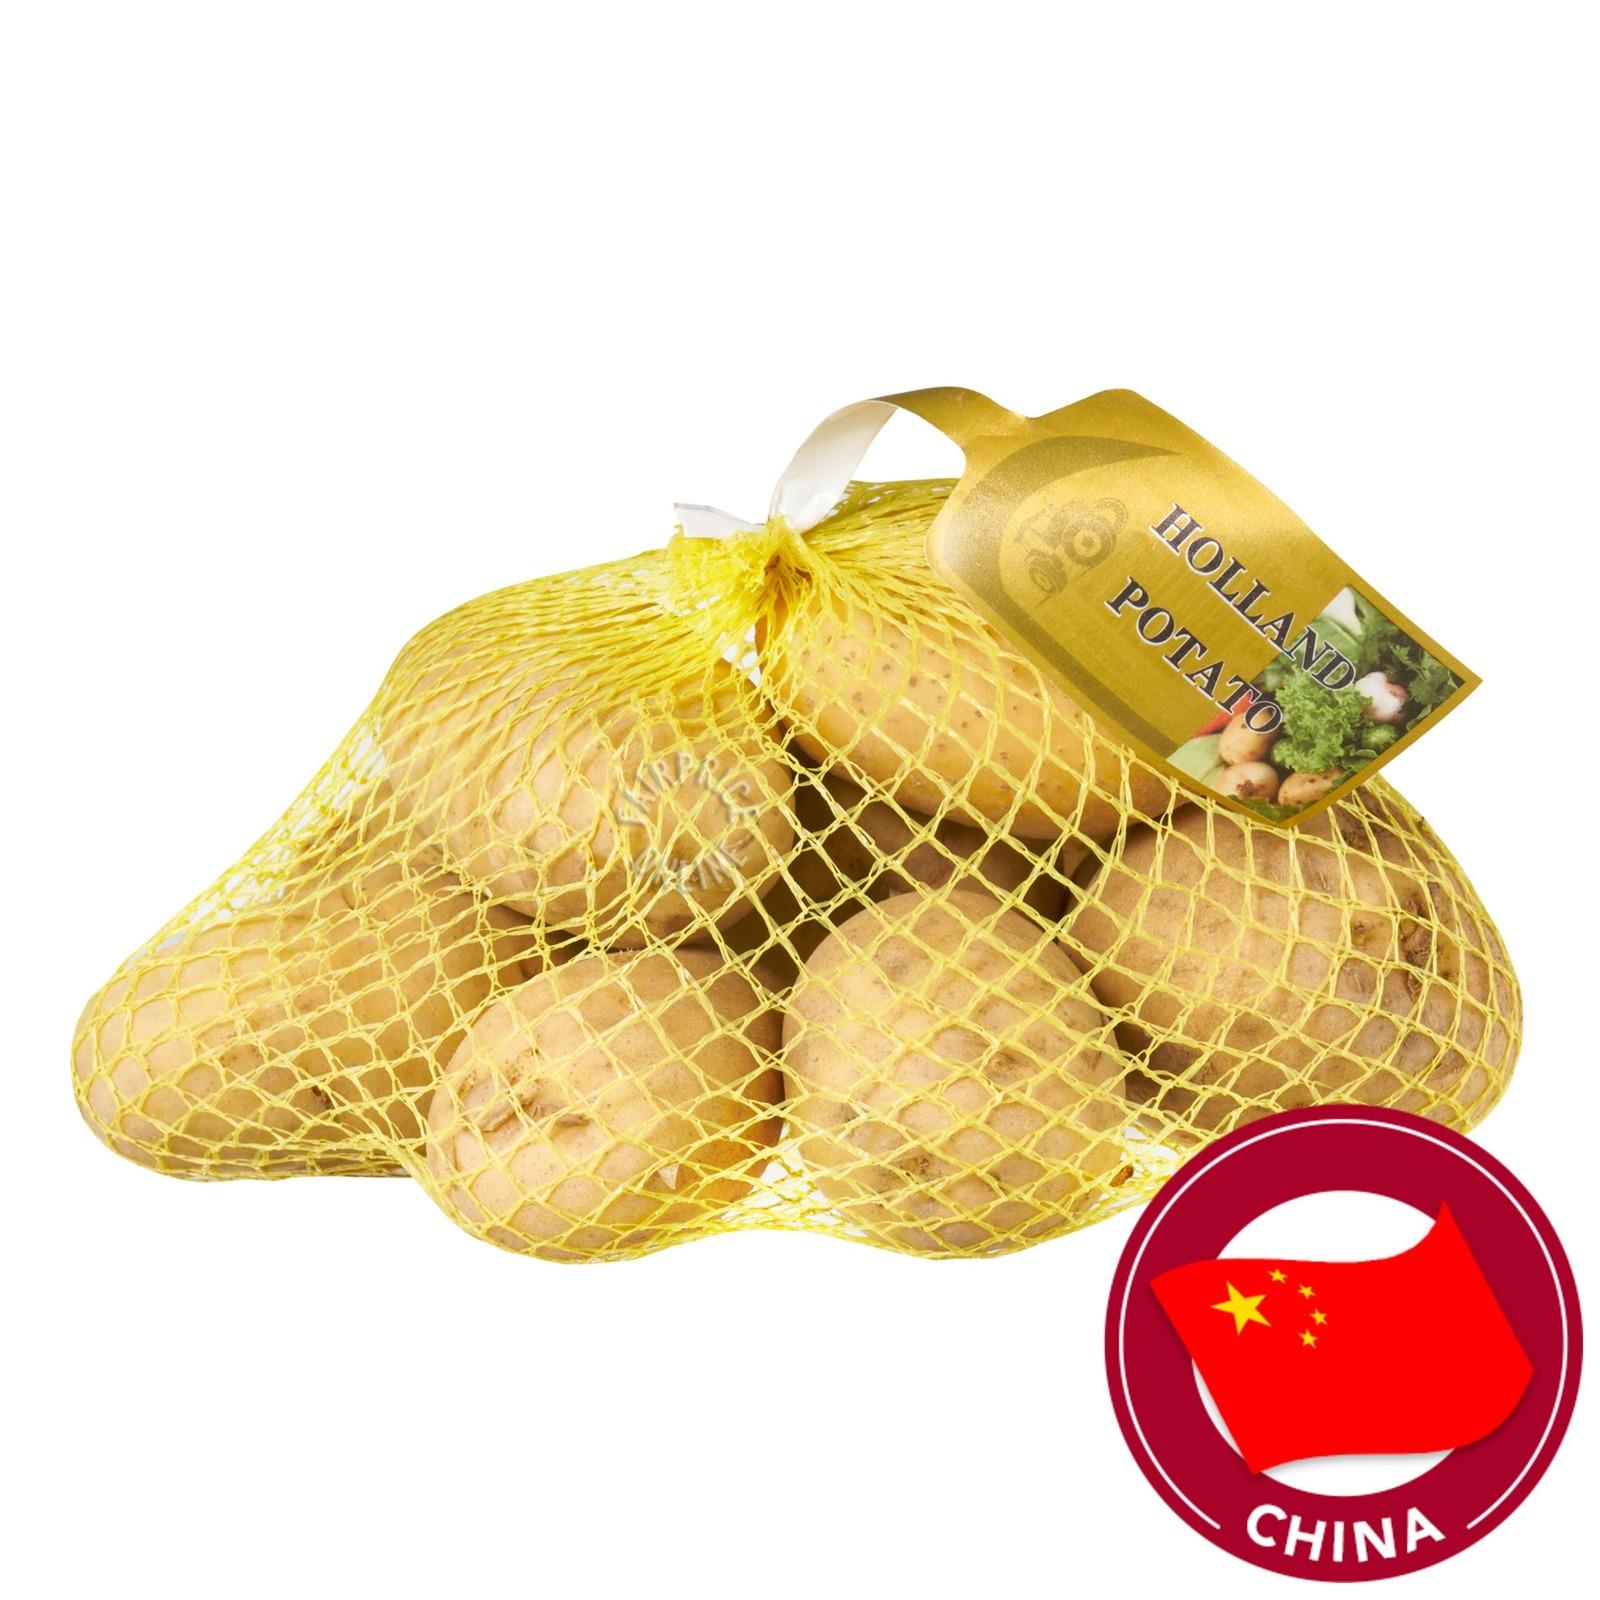 Holland Potato (China)